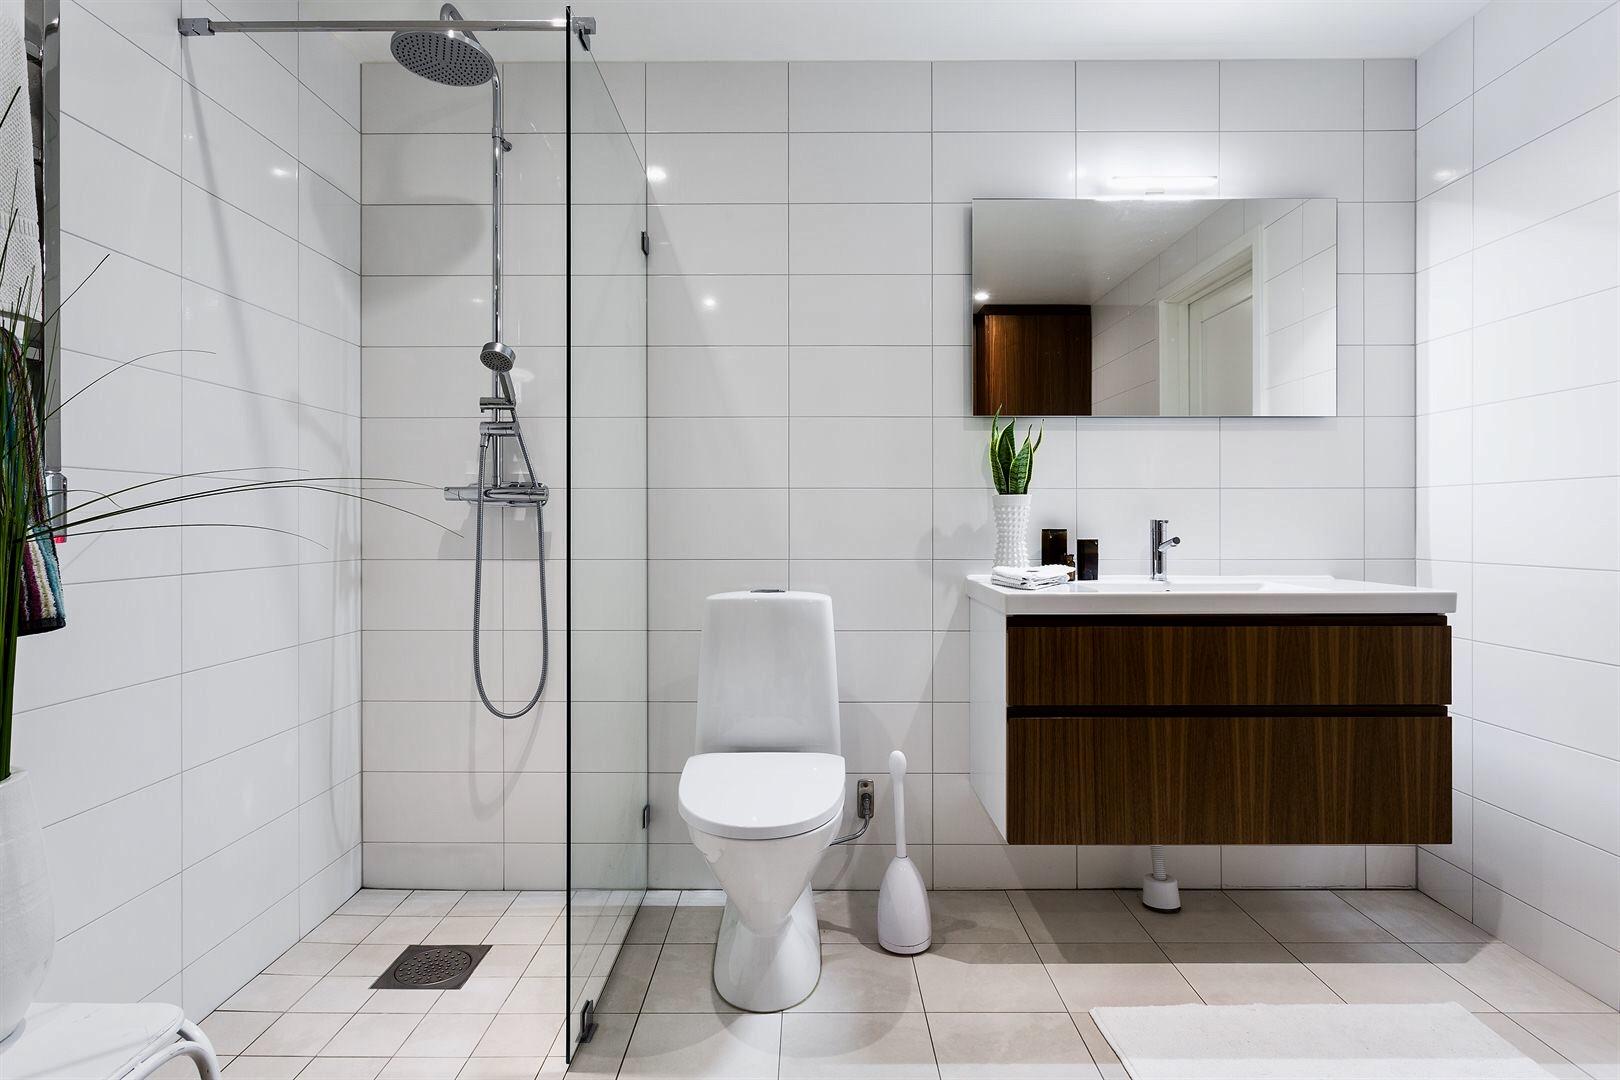 ванная комната санузел душевая кабина трап унитаз раковина смеситель зеркало комод белая плитка